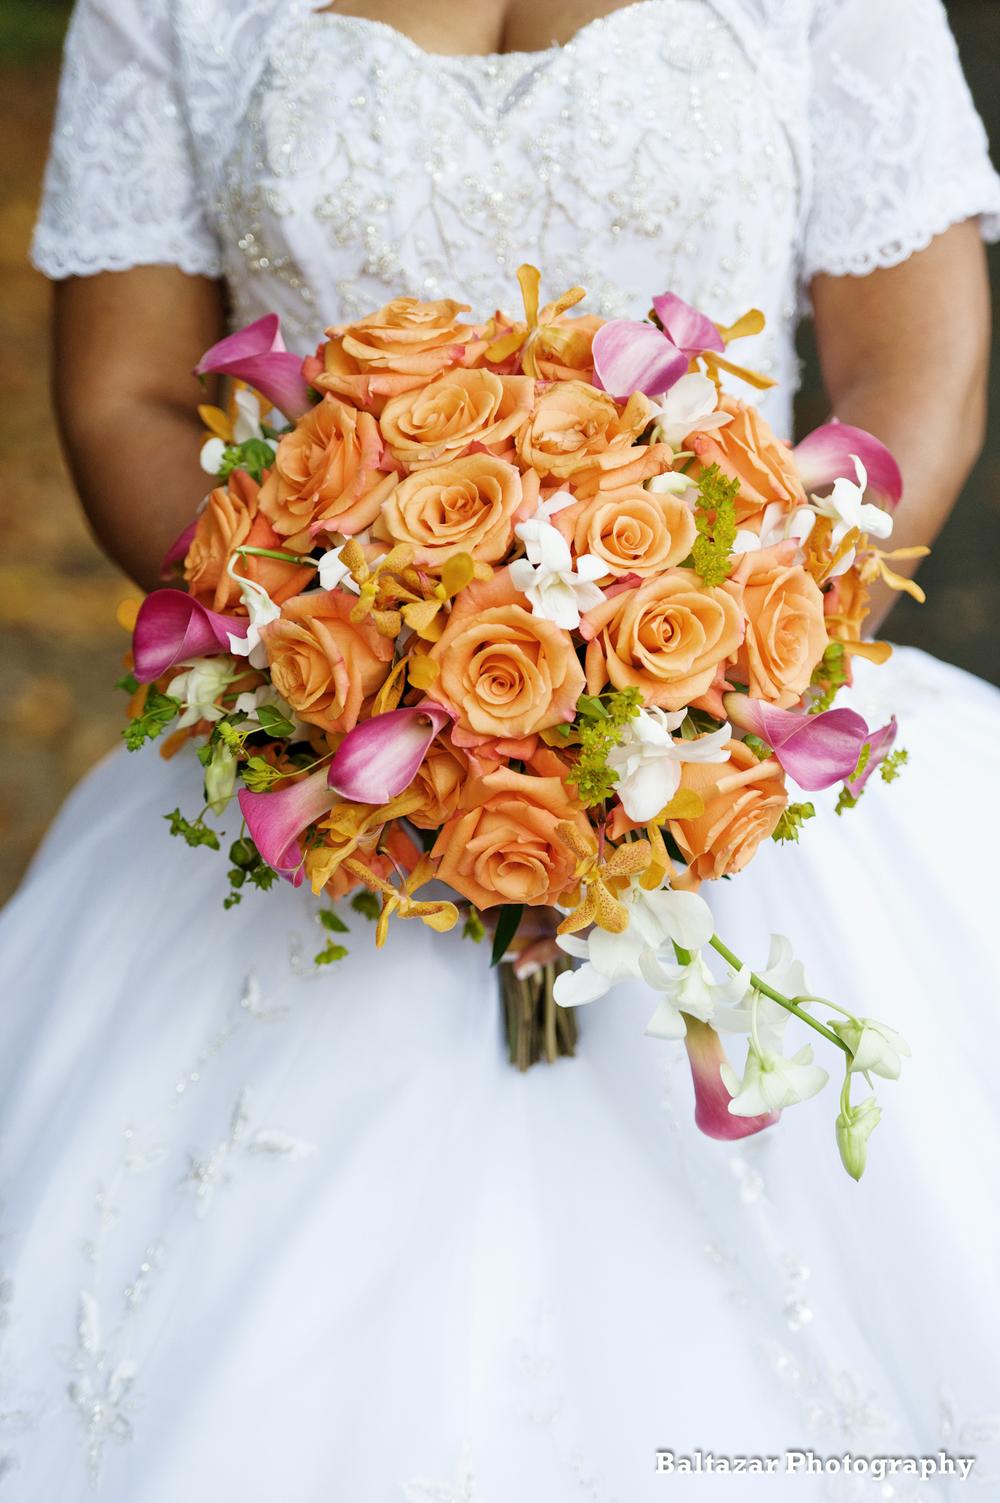 Pure Elegance Events - Portfolio Page - Kushin & Roye Wedding (11).jpg